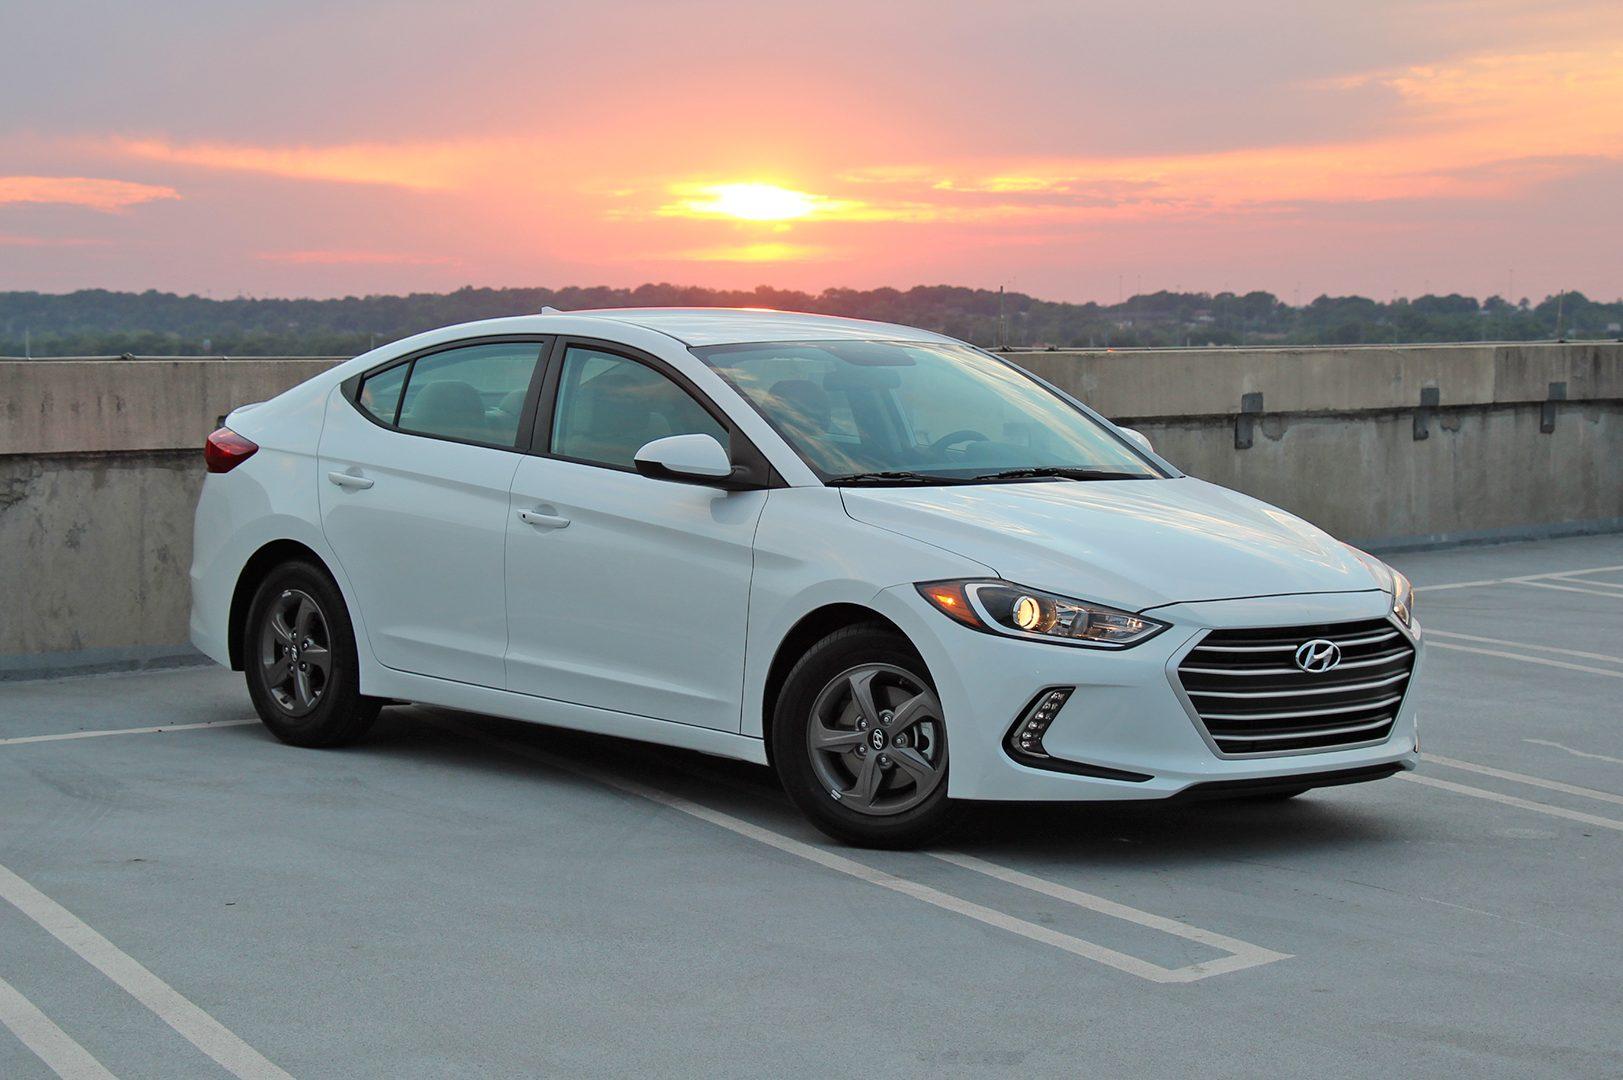 Hyundai Offering On Demand Test Drives Of 2017 Elantra